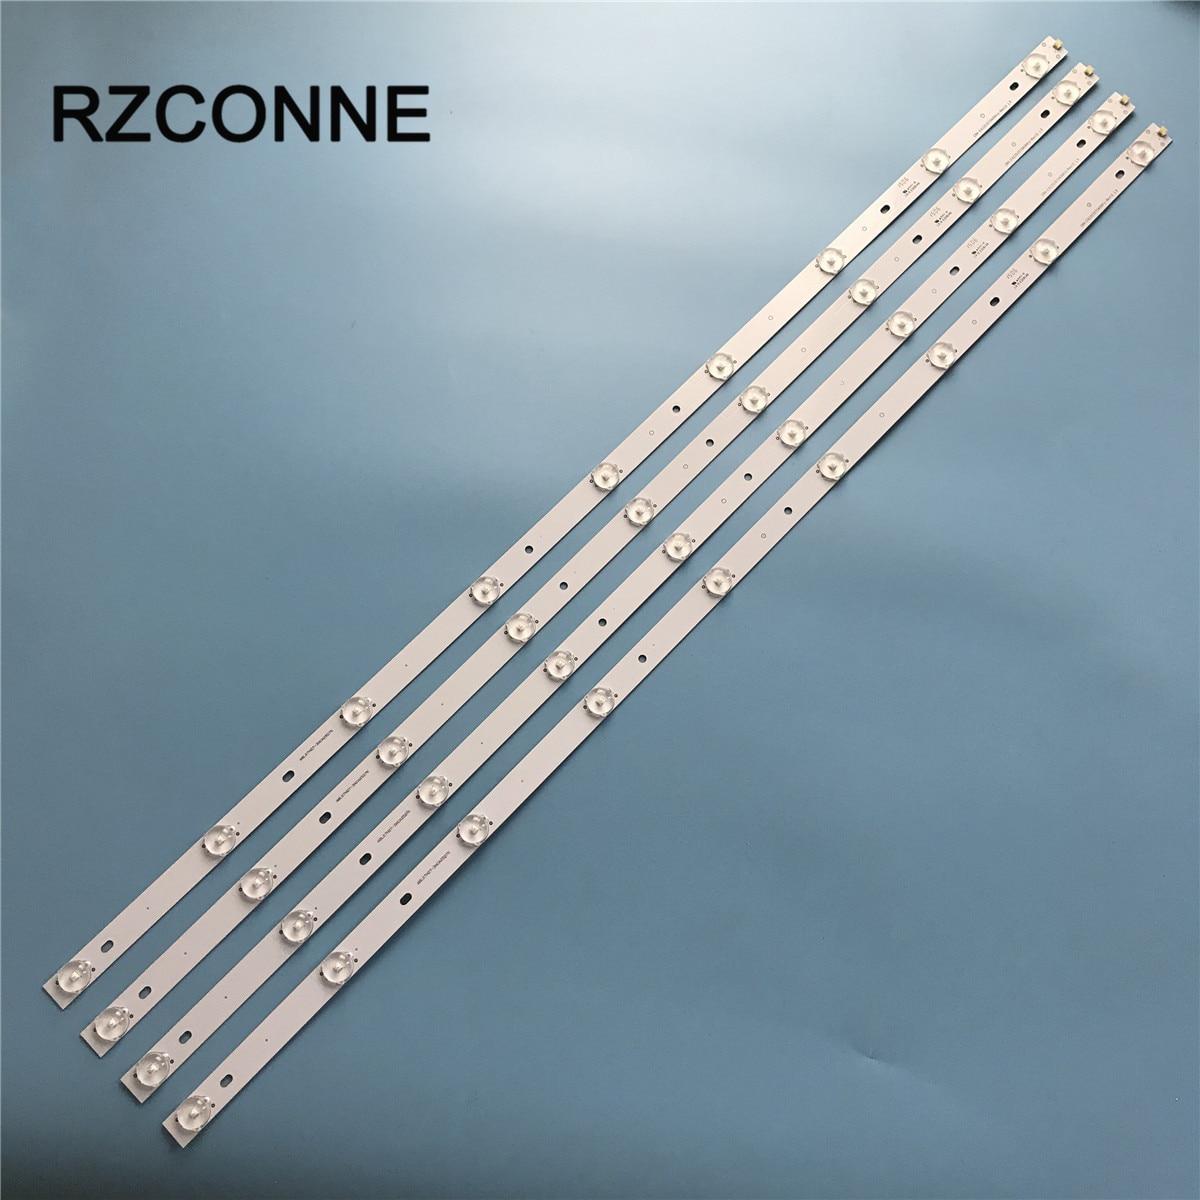 LED الخلفية قطاع 9 المصابيح ل TCL 42E10 هاير H42E07 H42E12 CRH-E423535T040941J REV1.0 SS42D09-ZC14F-01